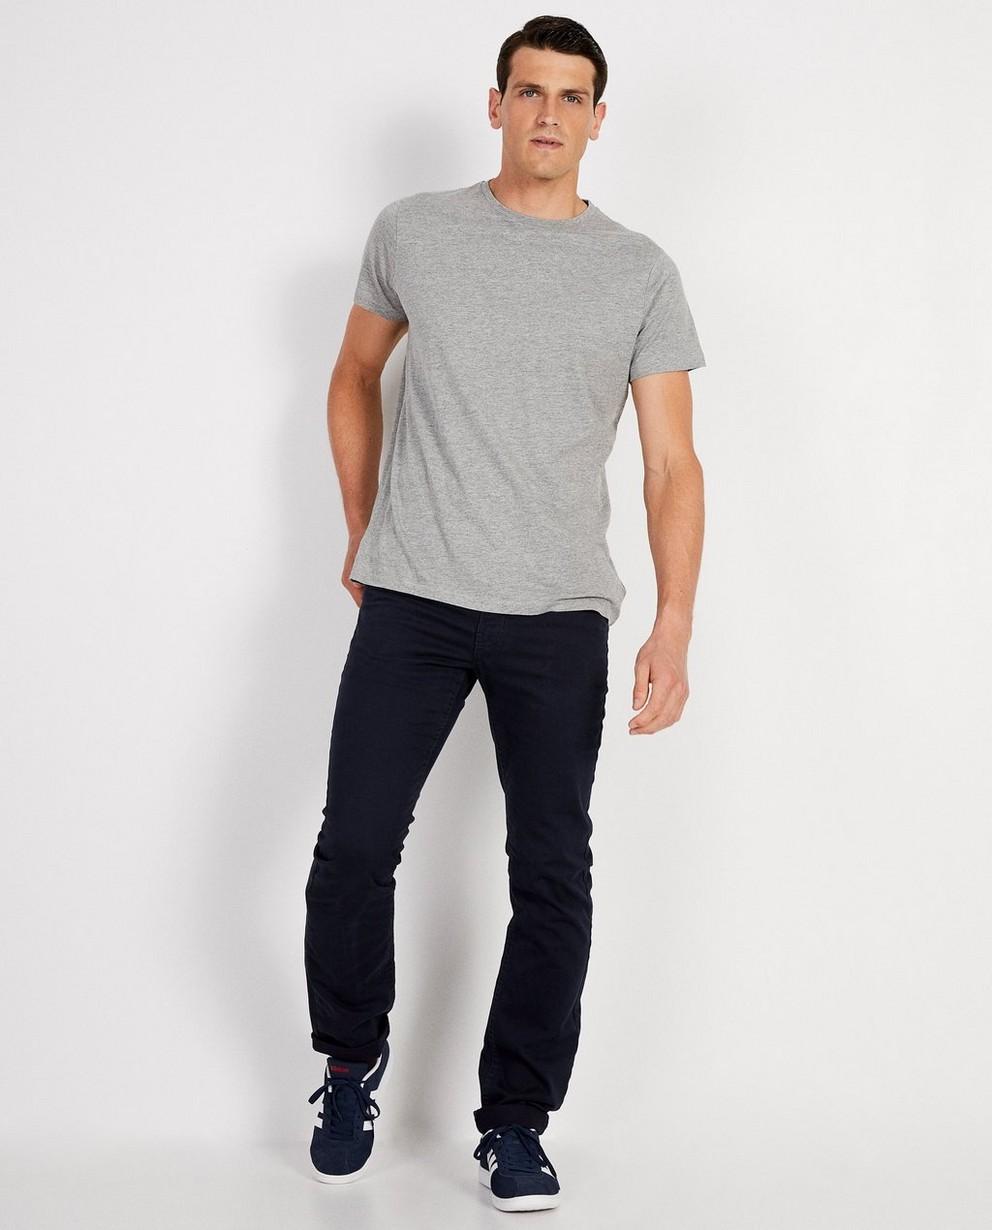 Marineblauwe rechte broek - Best price - JBC NL